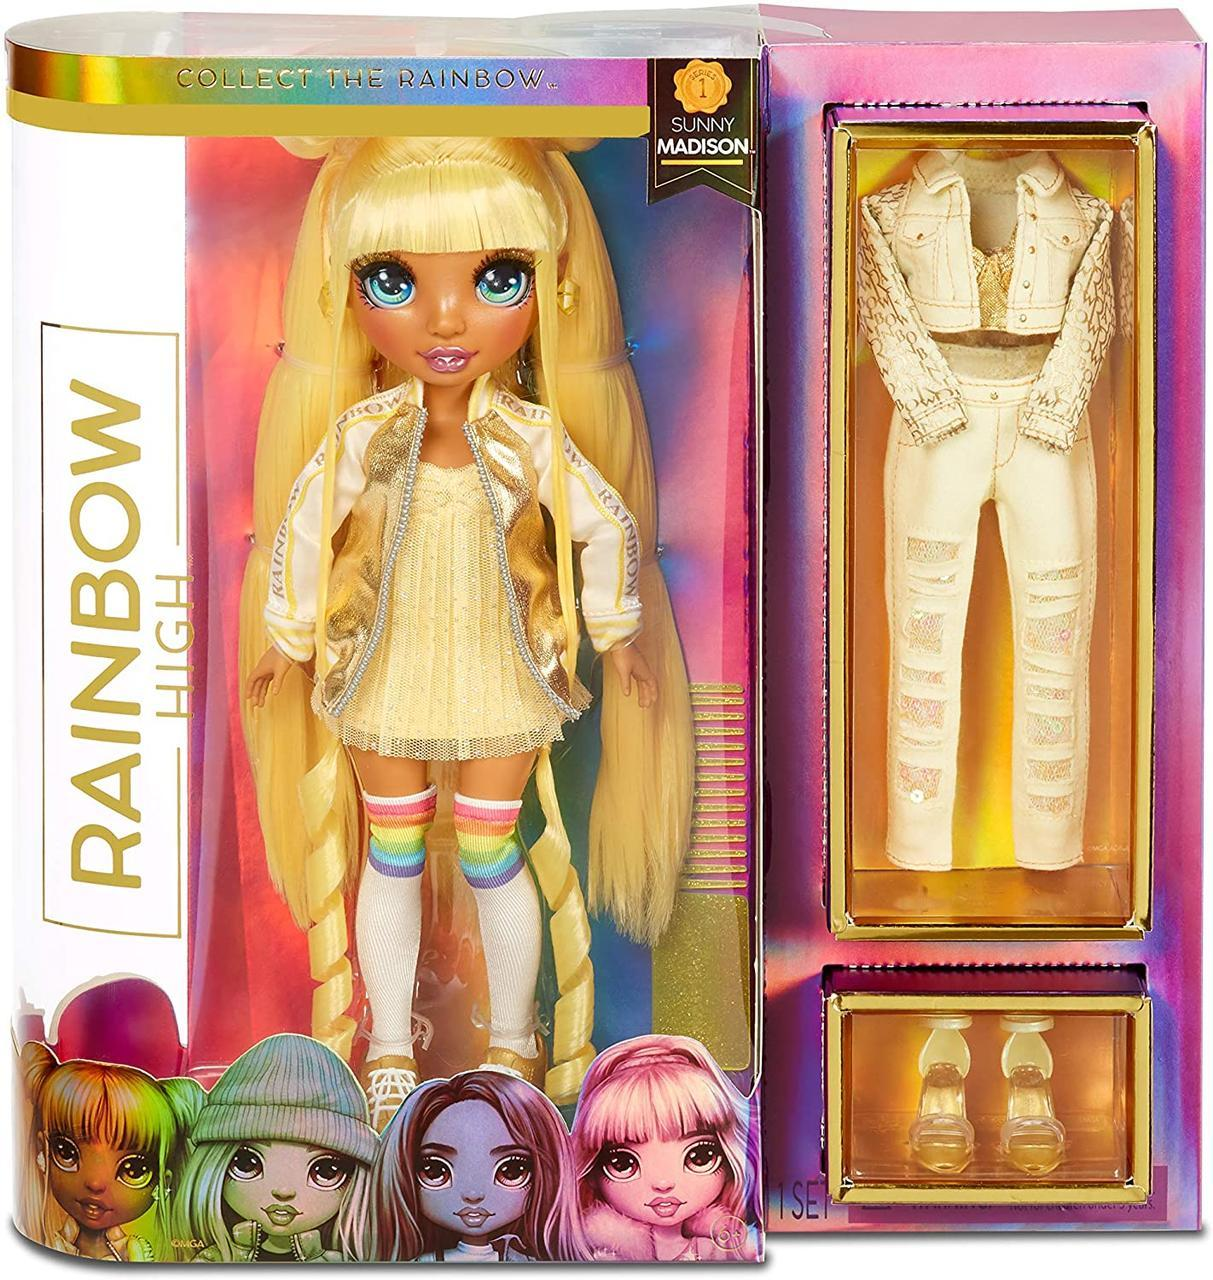 Уценка! Кукла Rainbow High Санни Sunny Madison Yellow Clothes Желтая Рейнбоу Хай Санни Медисон 569626 Оригинал